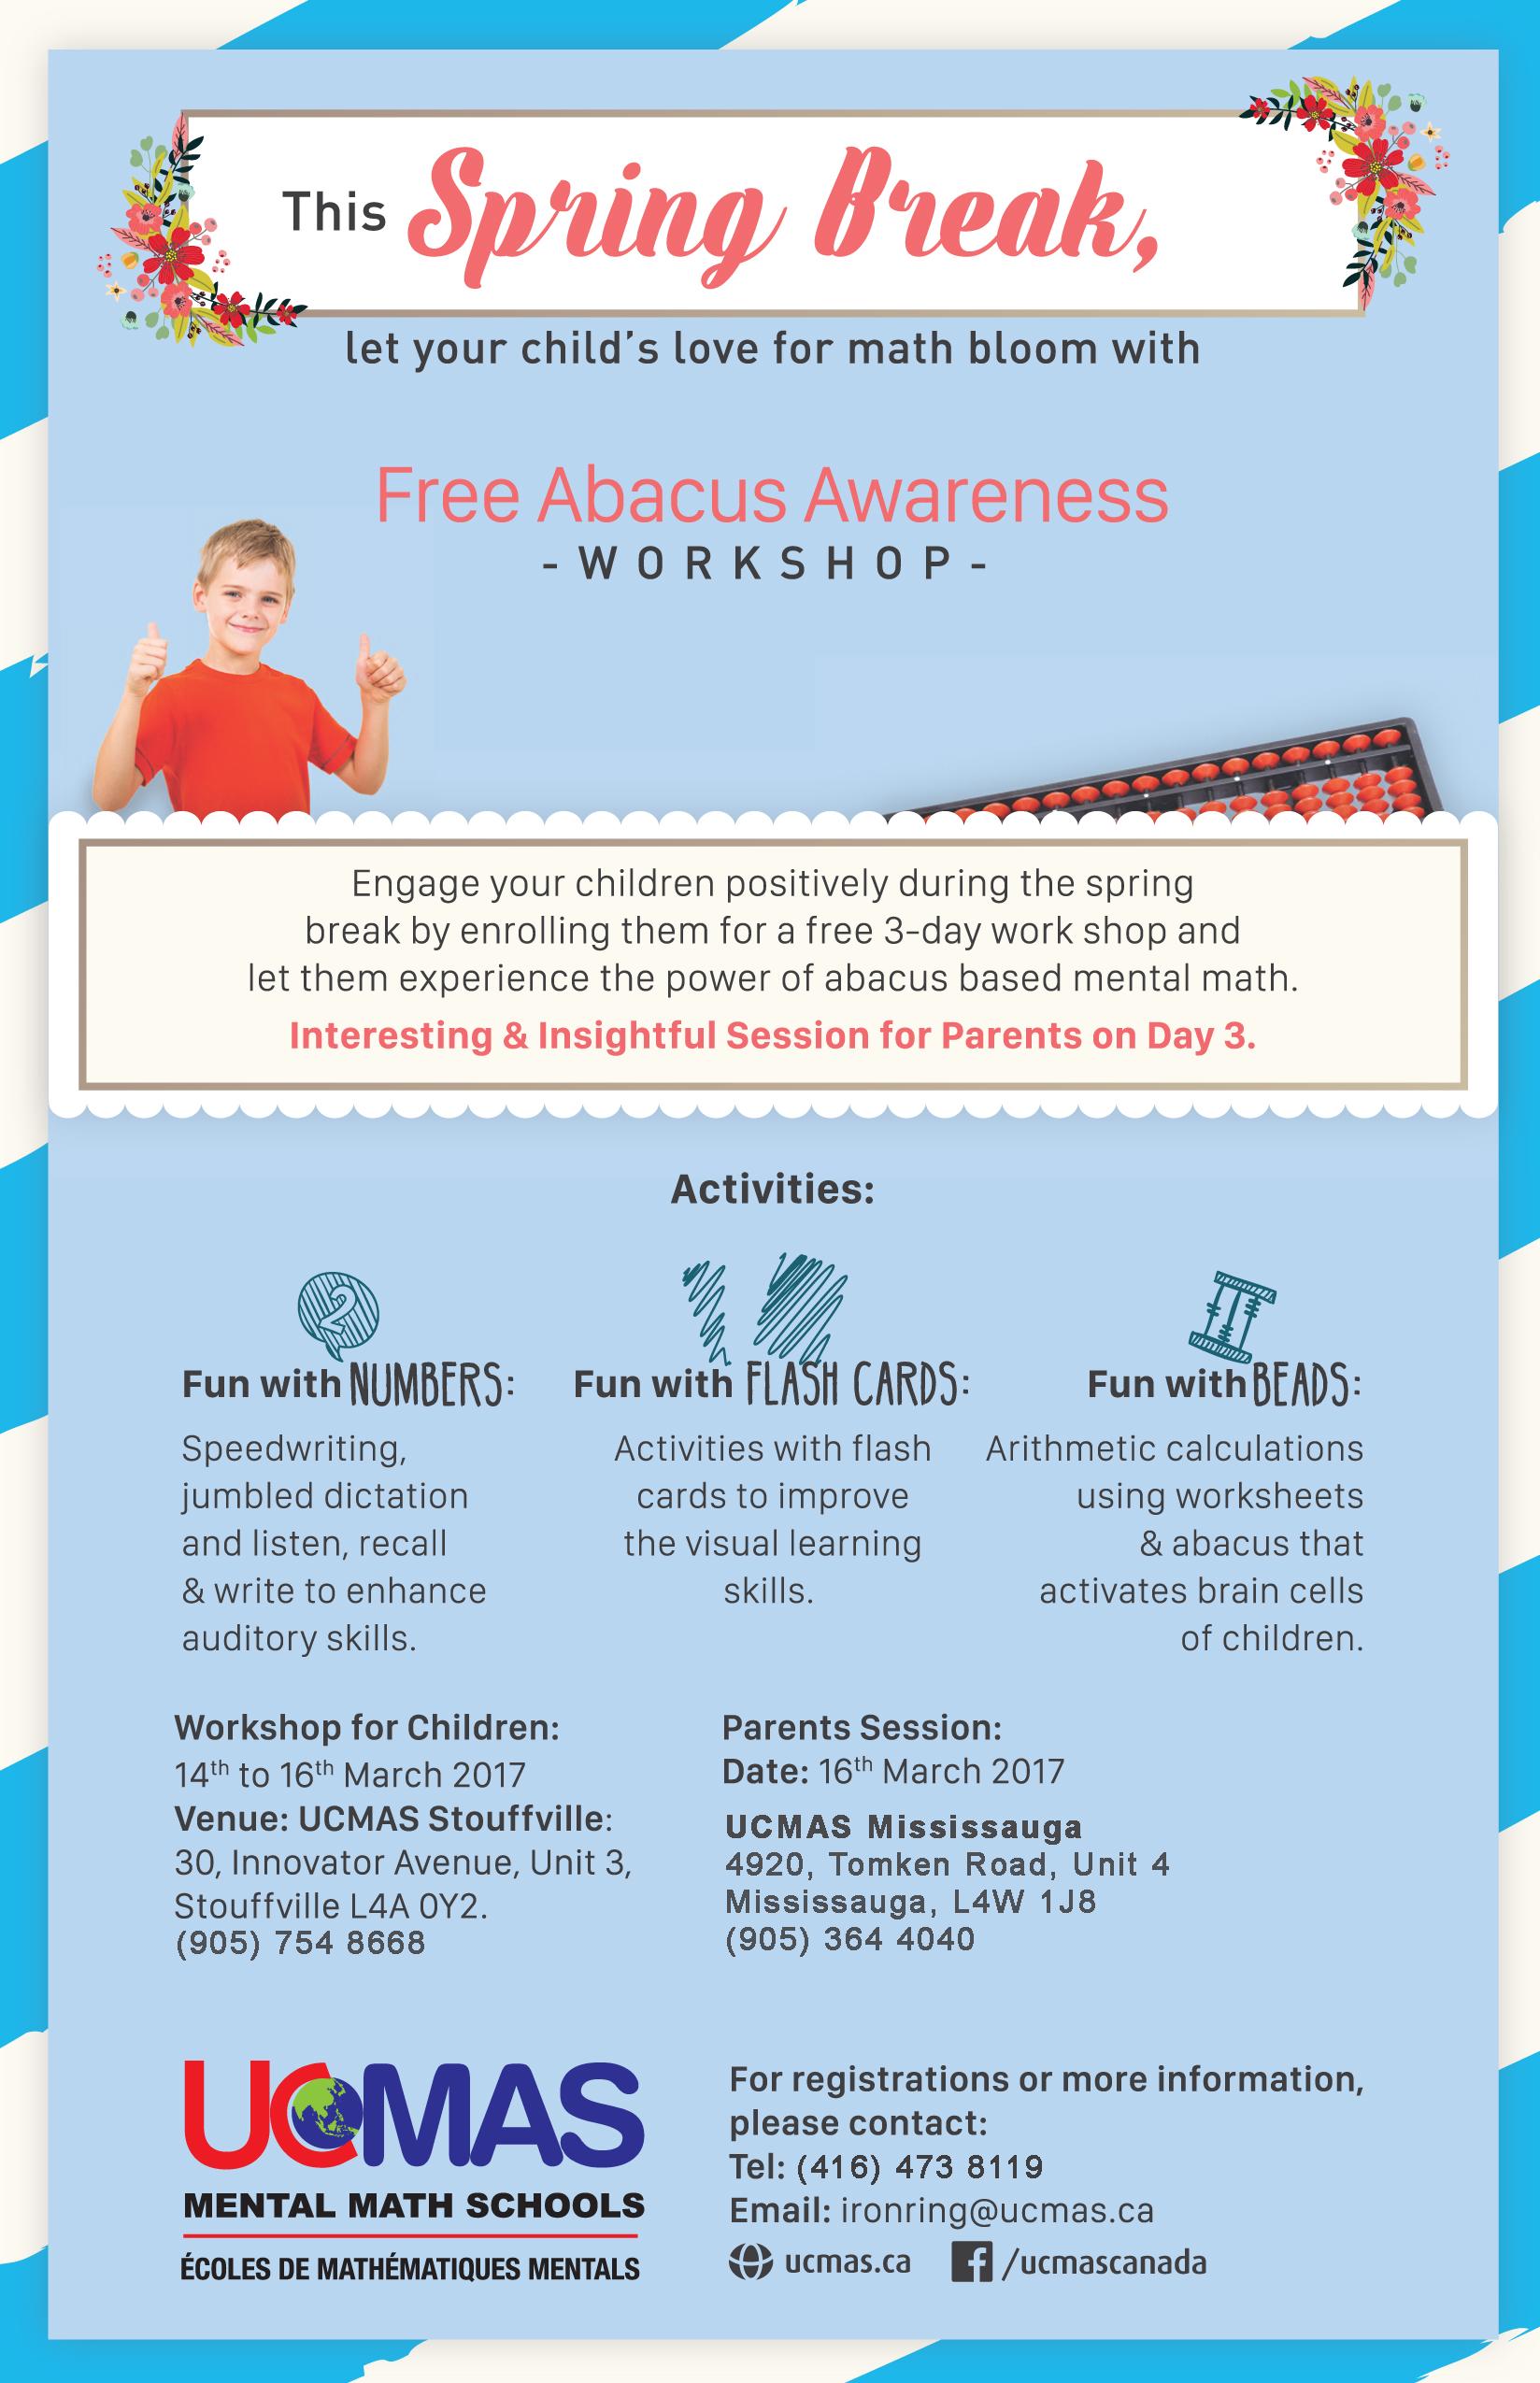 Free Abacus Awareness Workshop